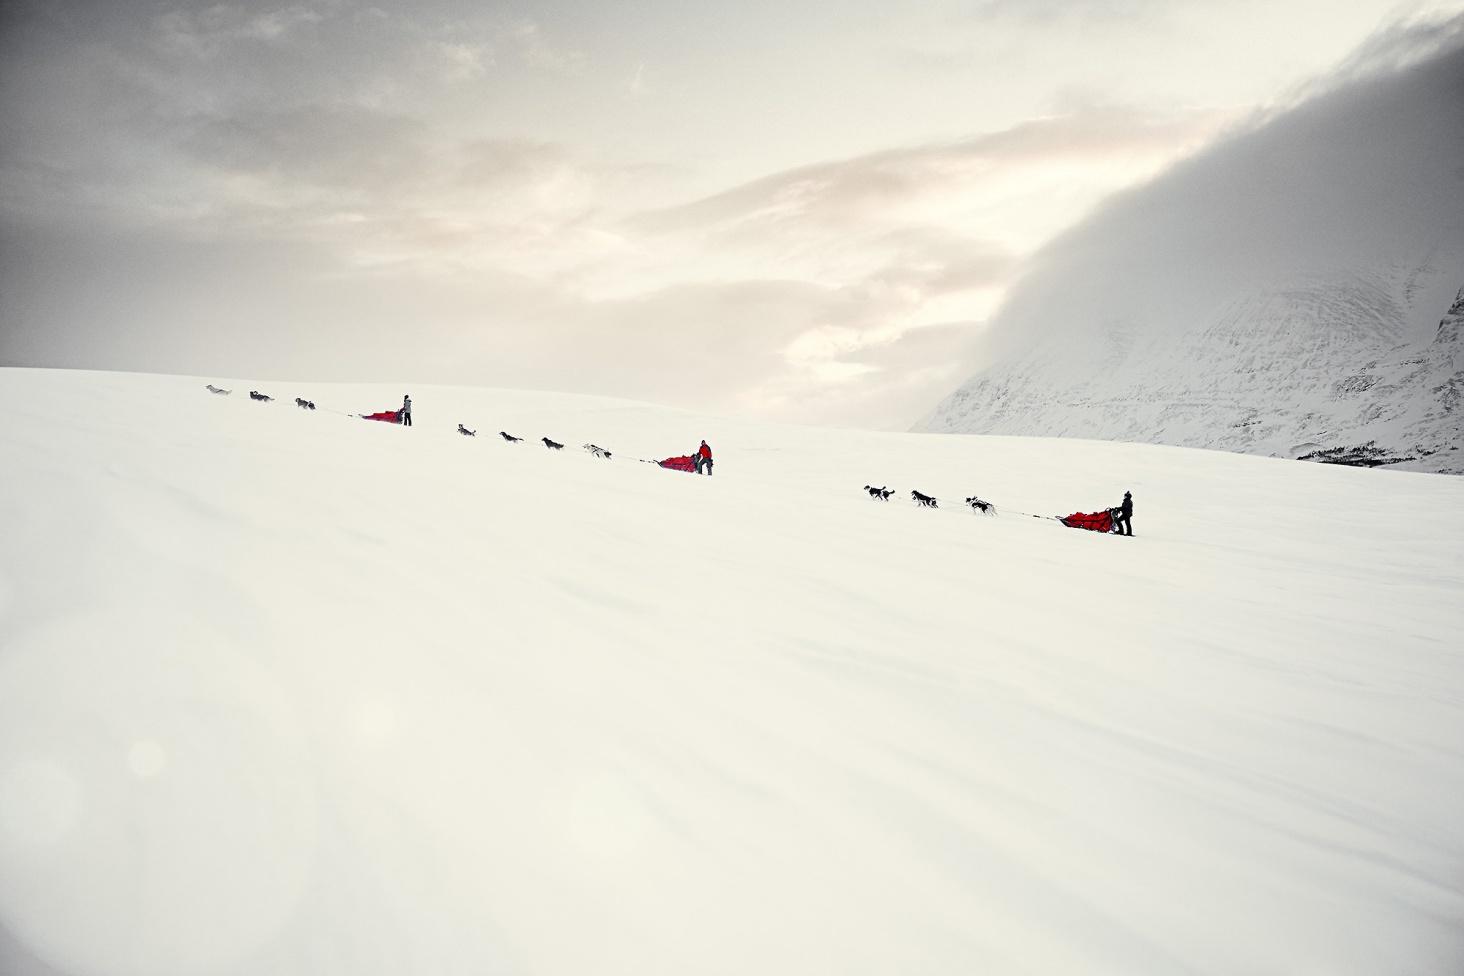 Lars Schneider Norwegen Hundeschlitten